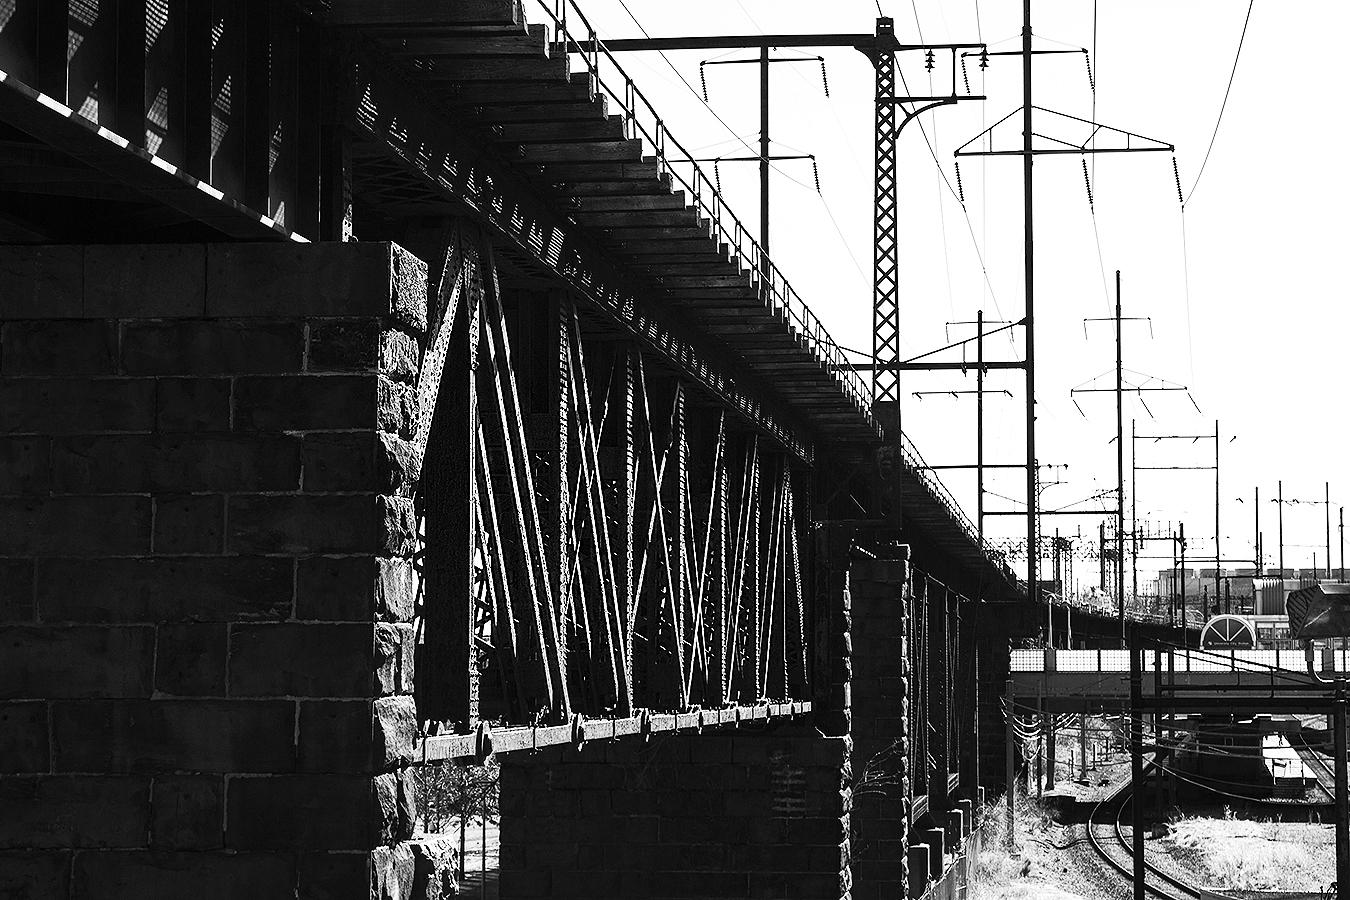 Janelle_Tong_Photography_Tony_Ward_Studio_Individual_Project_UPenn_Penn_Park_Bridges_Railroad_Tracks_SEPTA_Black_and_White